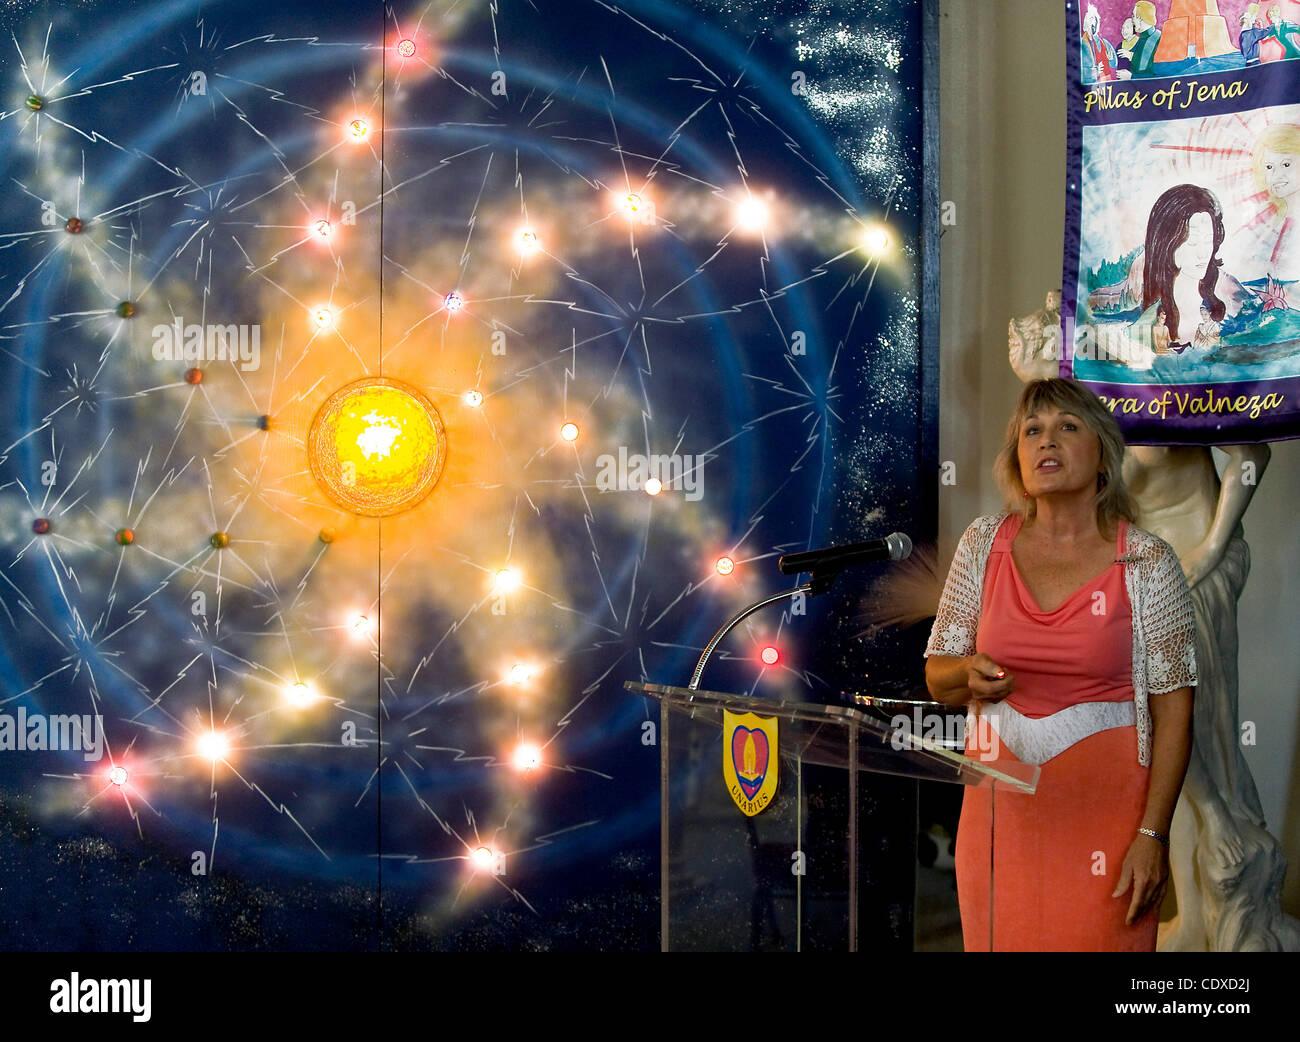 Oct. 15, 2011 - El Cajon, California, USA -  Lani Calvert speaks about life on the planet Deva at the Unarius Academy - Stock Image